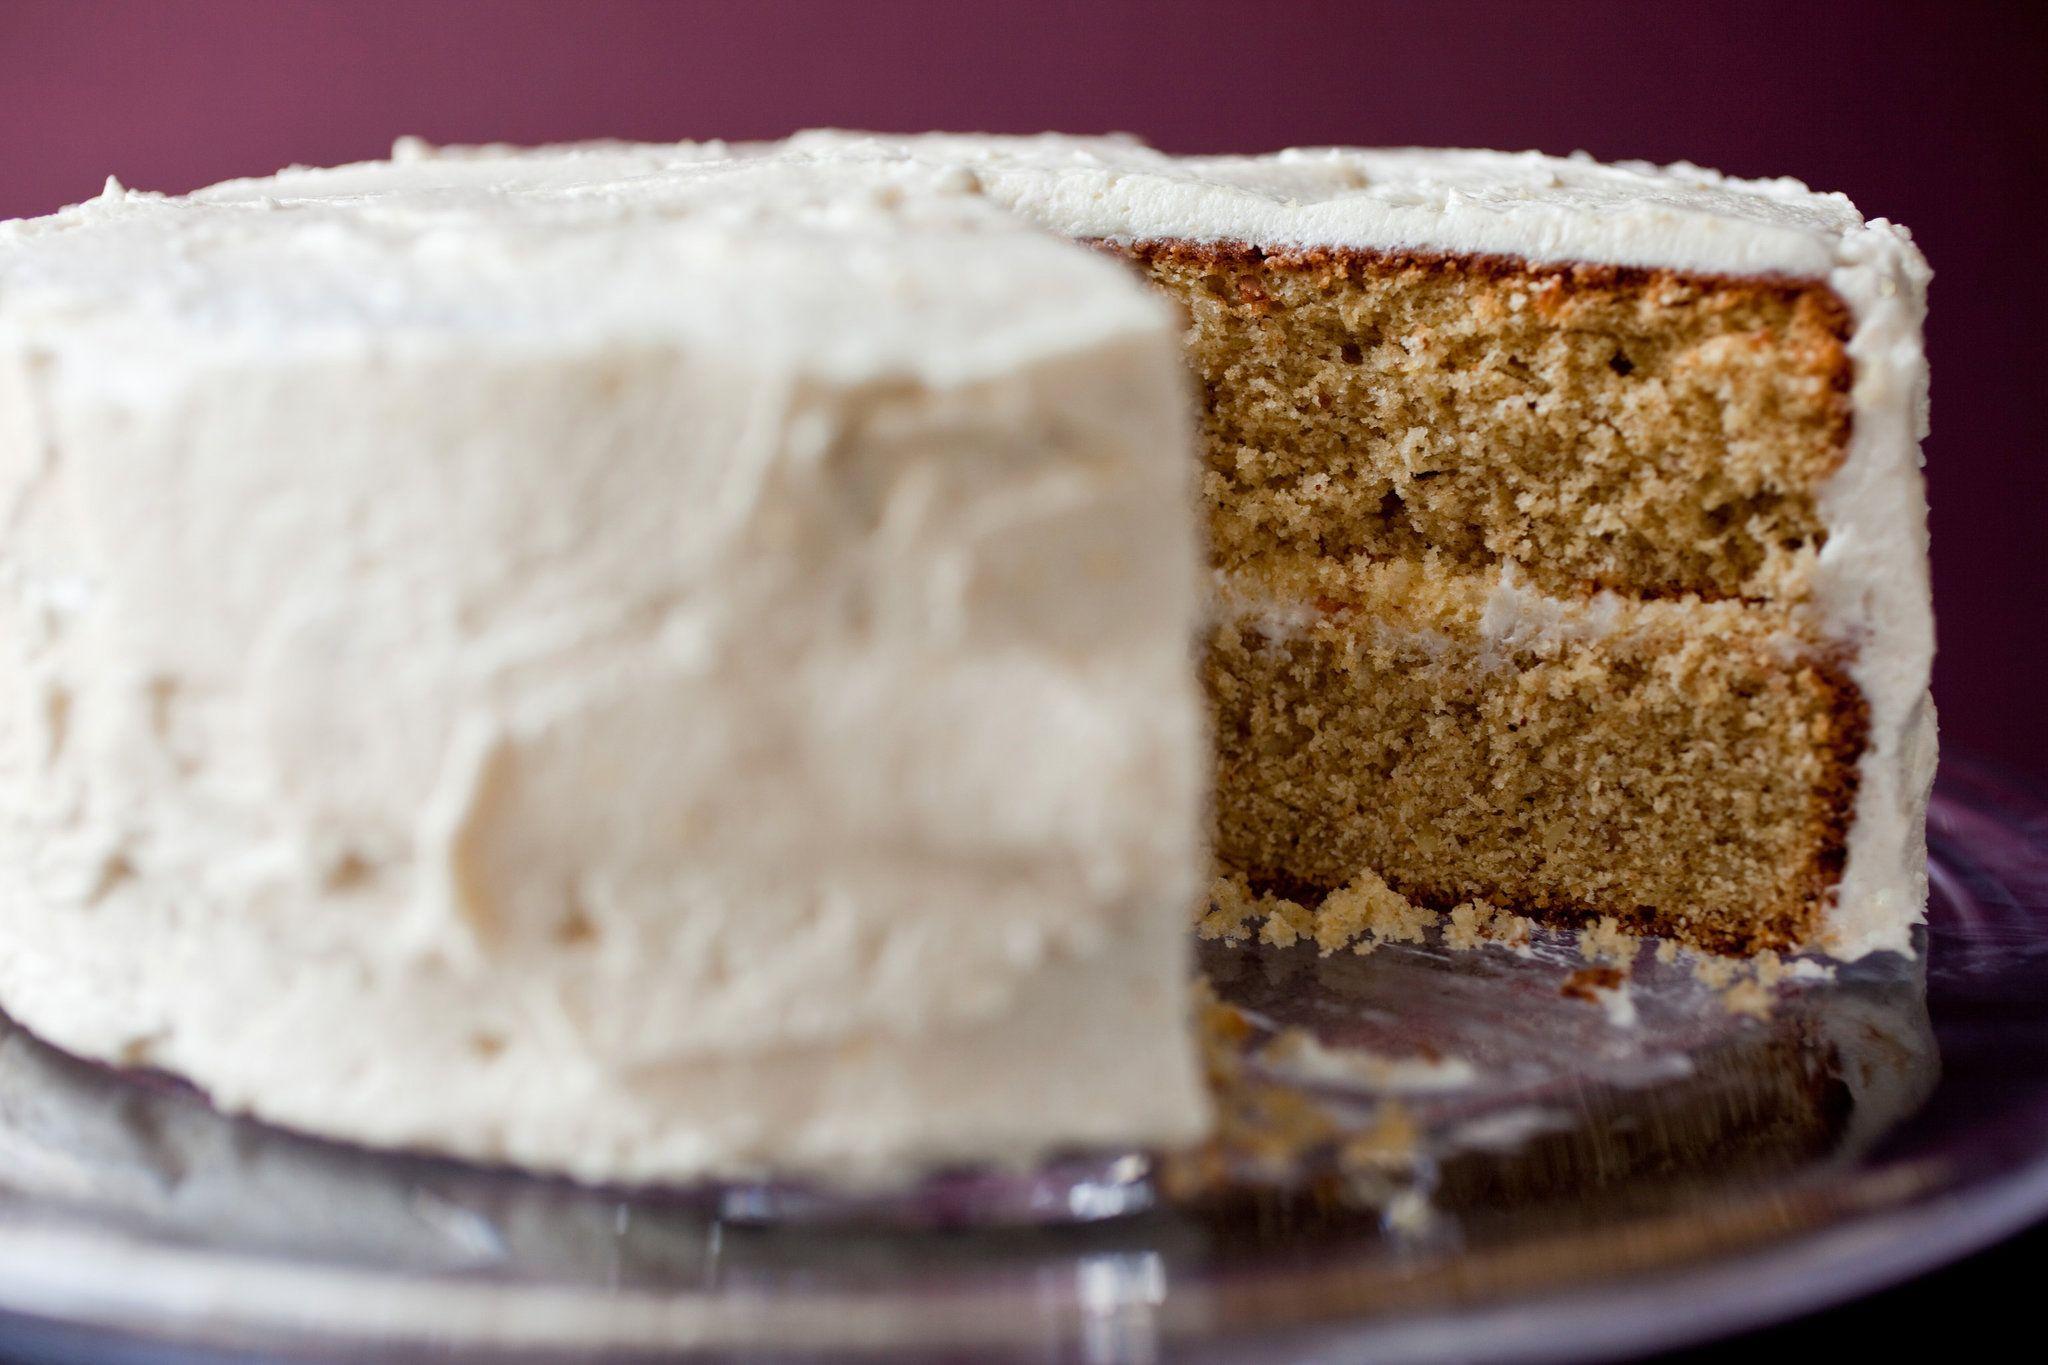 nytimes blueberry almond lemon cake